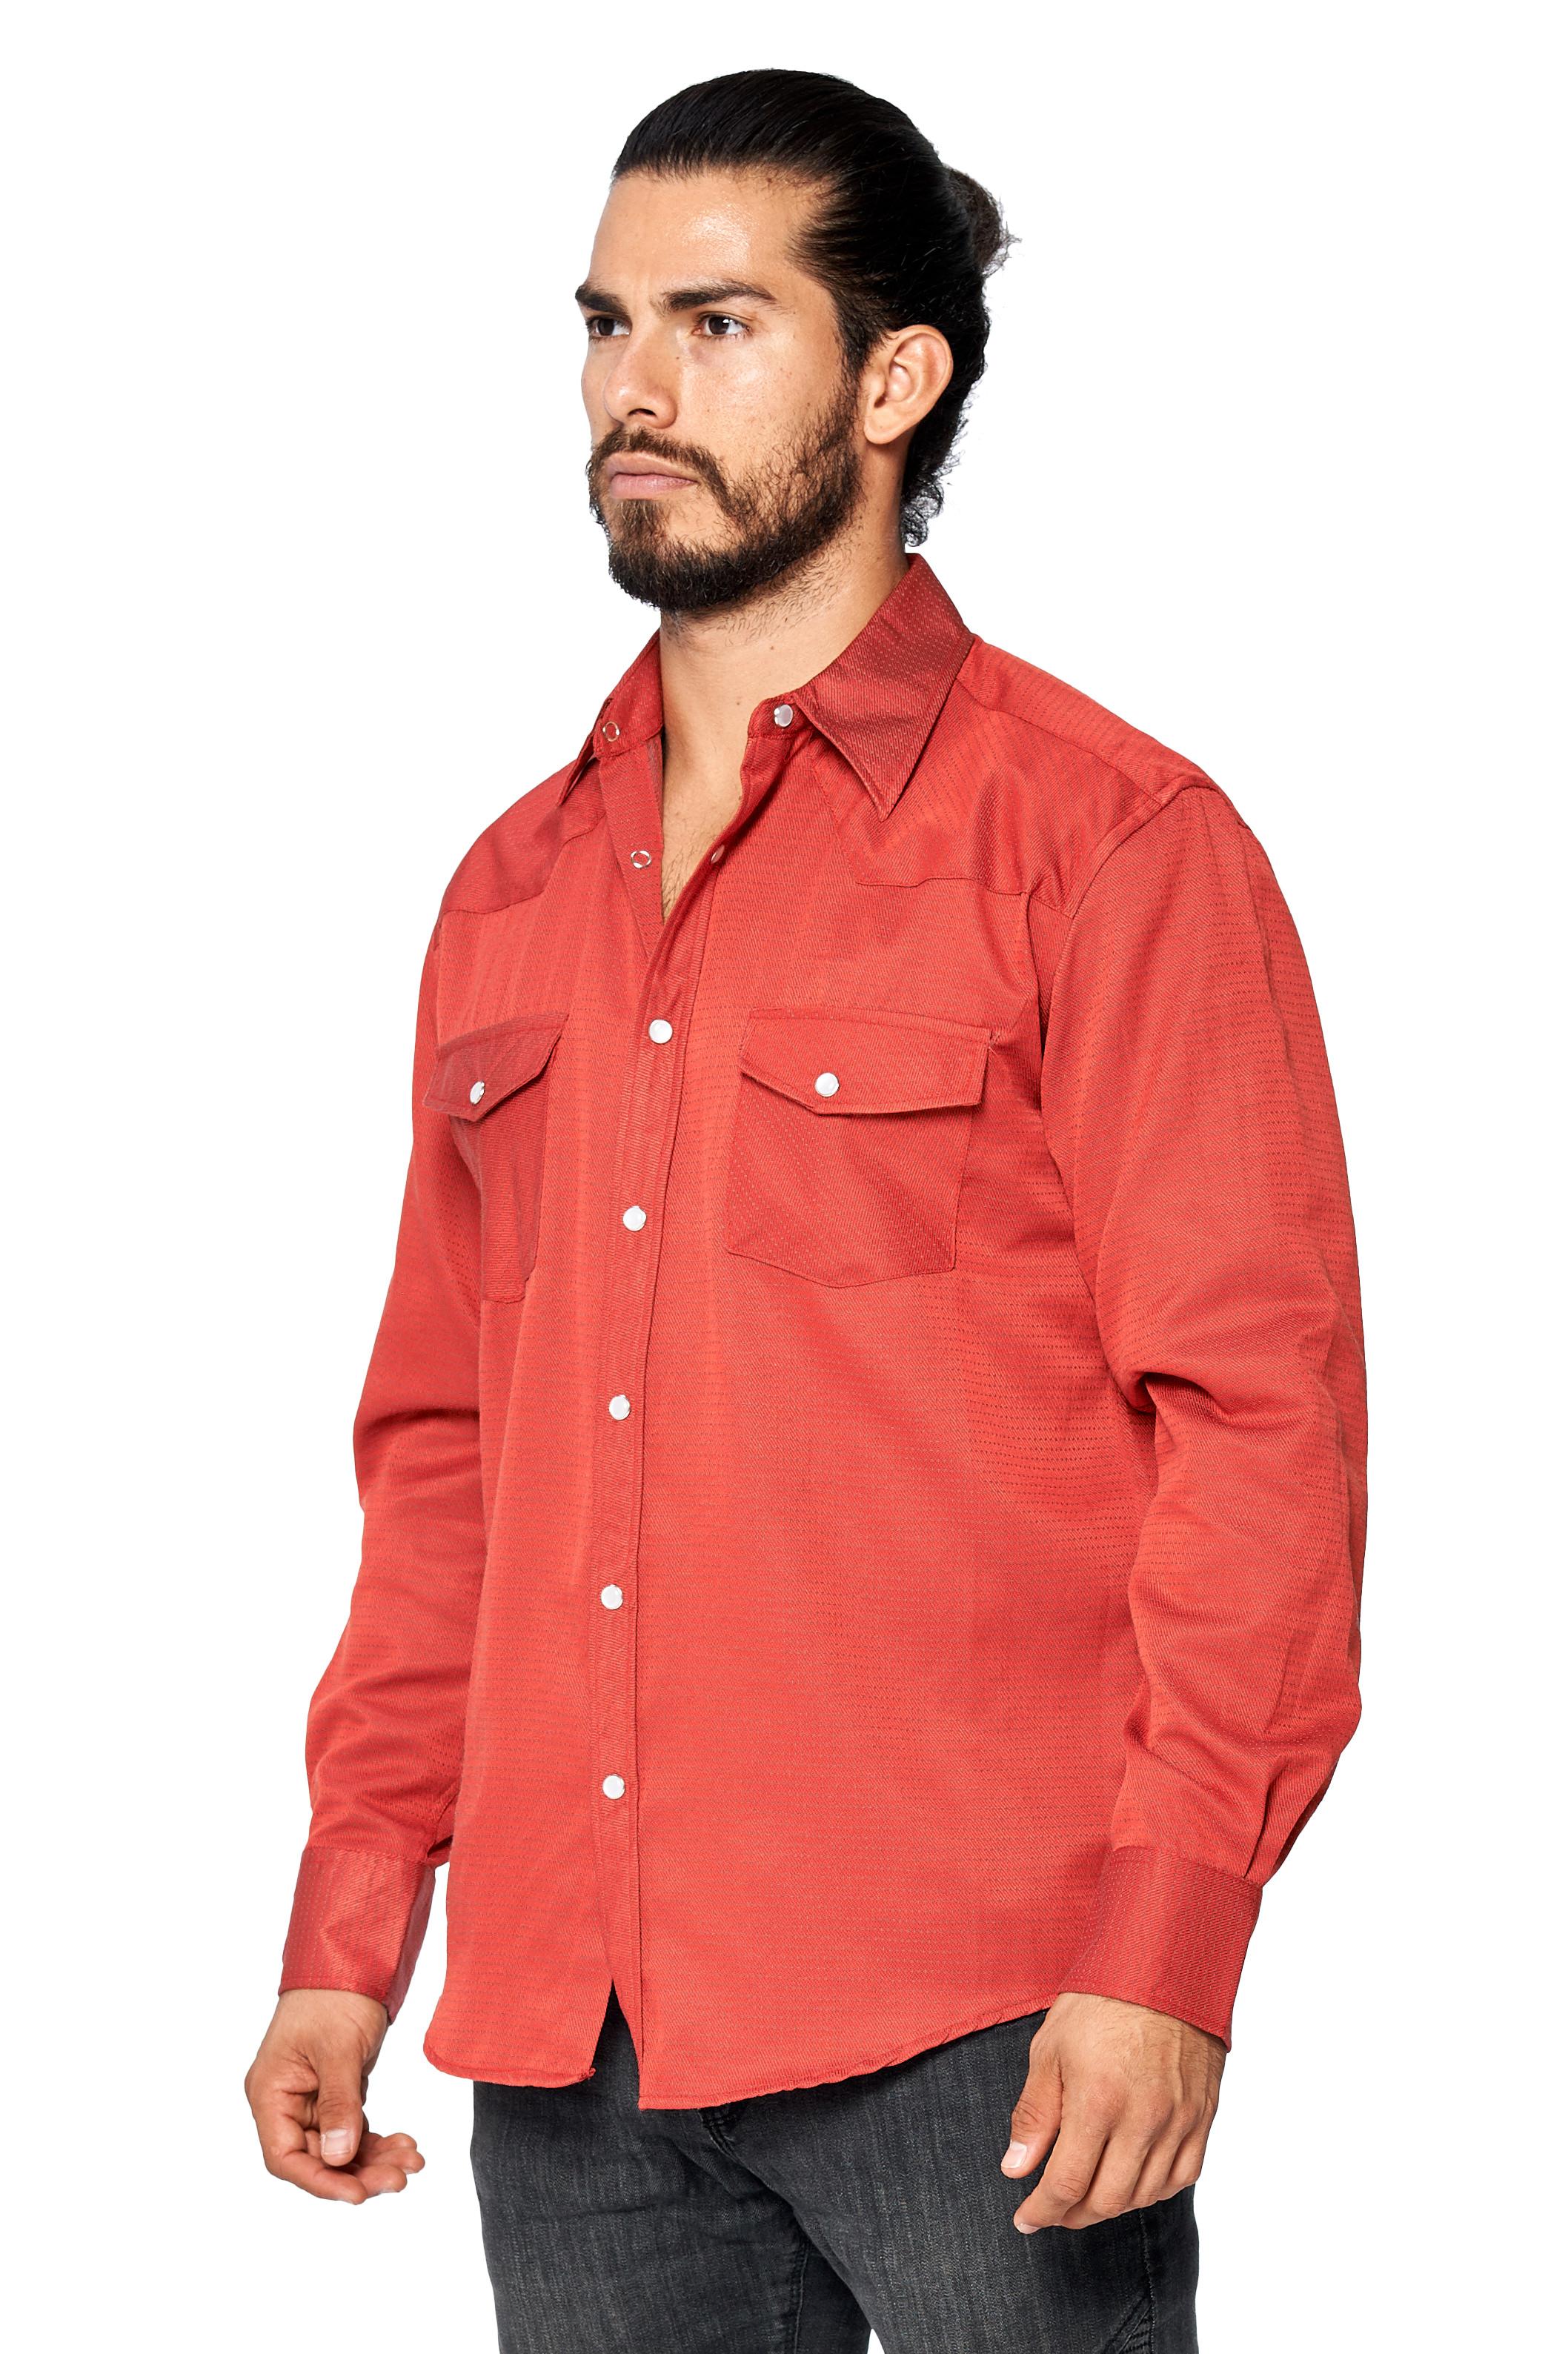 LW-Men-039-s-Pearl-Snap-Tribal-Stylish-Printed-Woven-Western-Vaquero-Rodeo-Shirt thumbnail 42